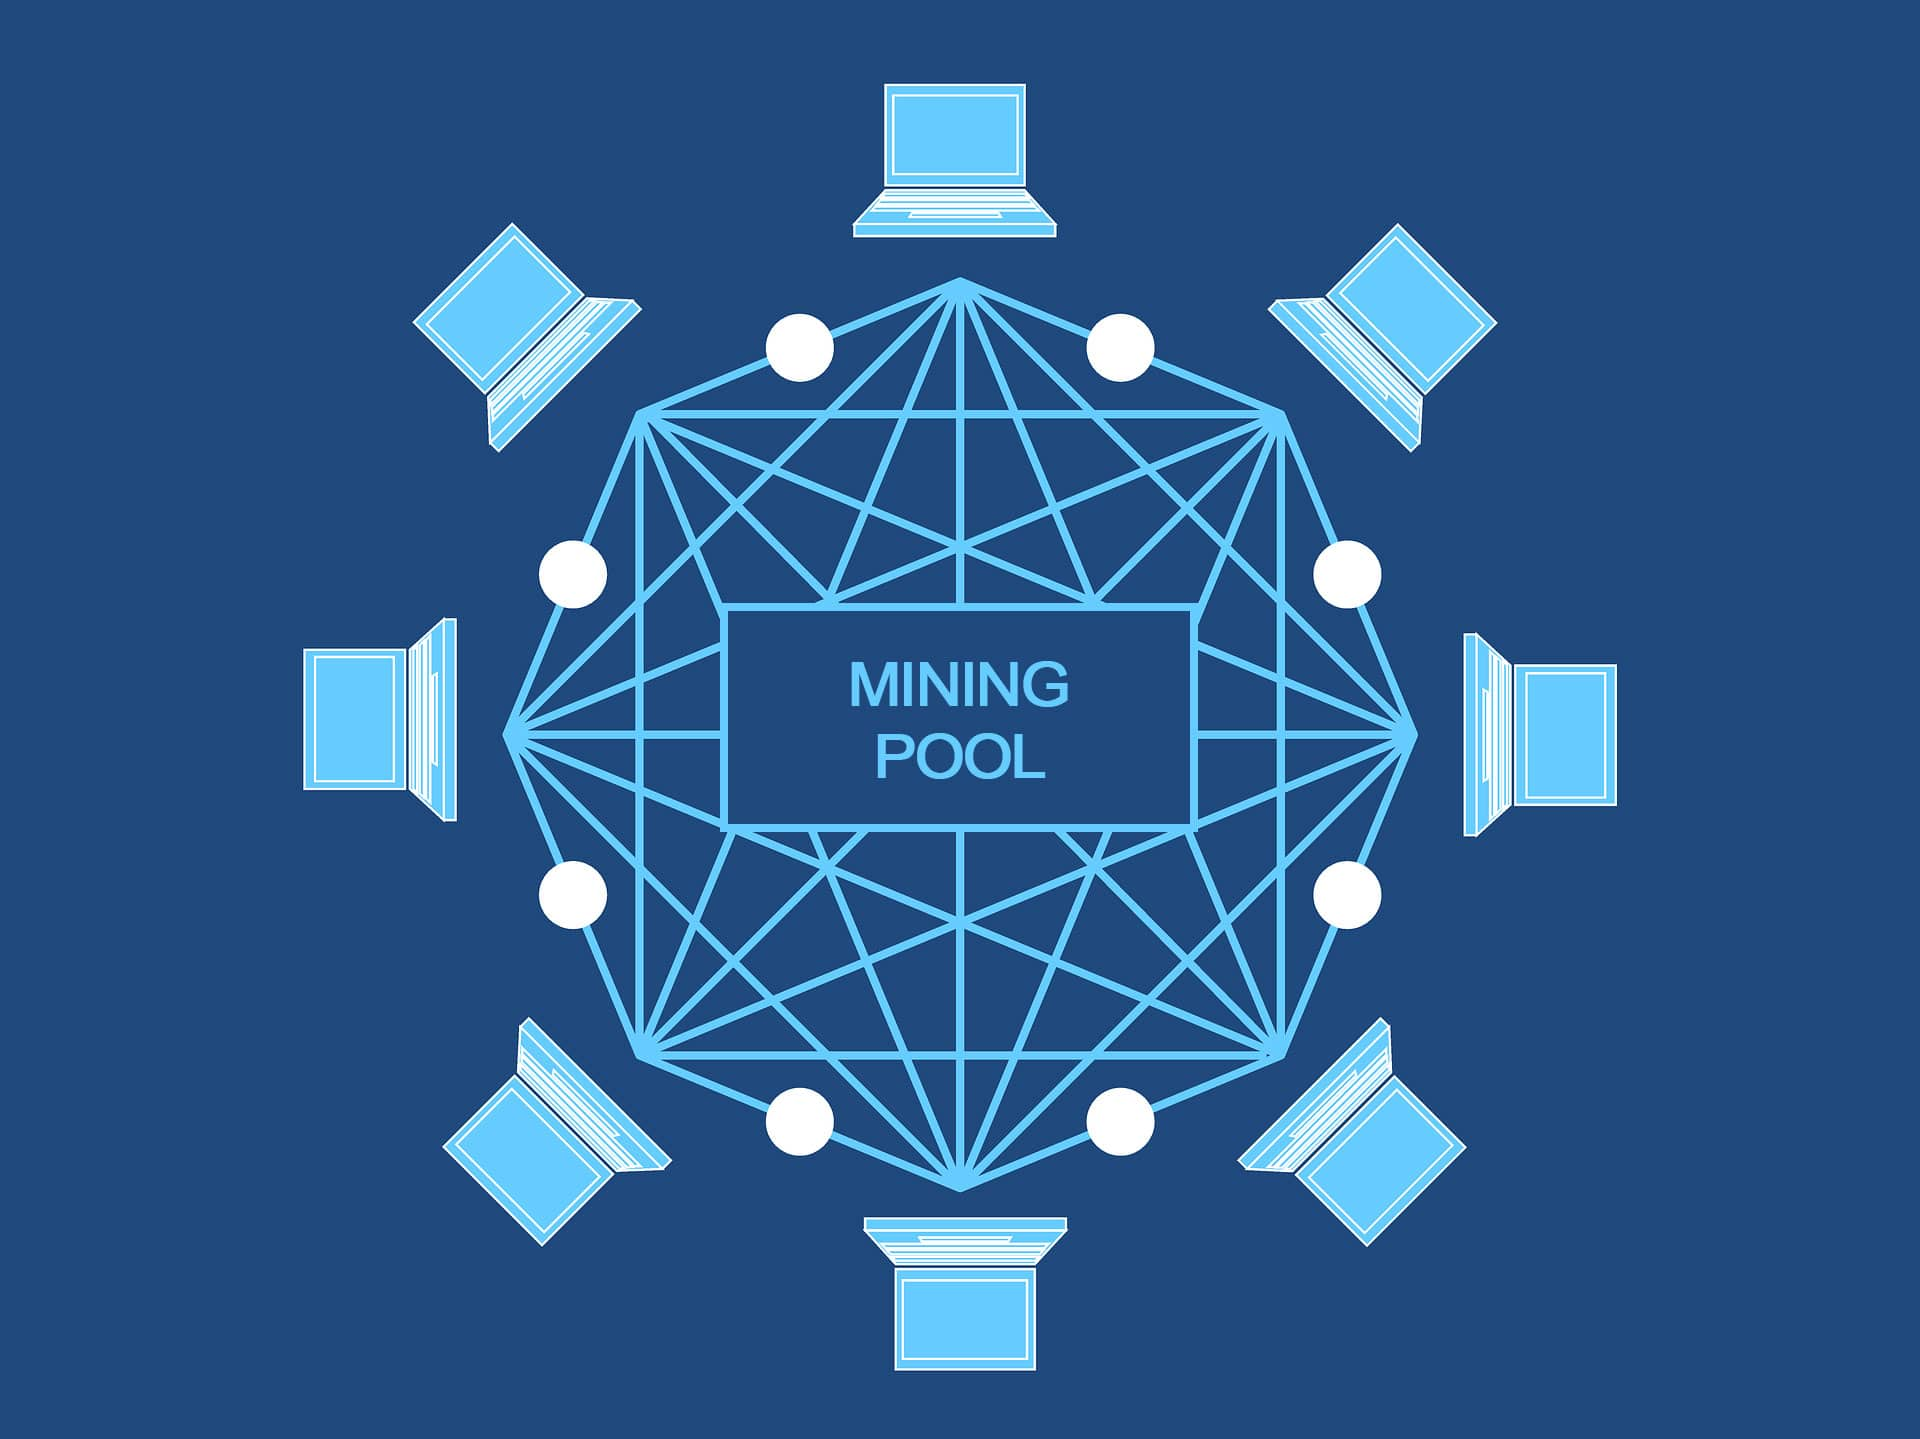 Piscinas mineras